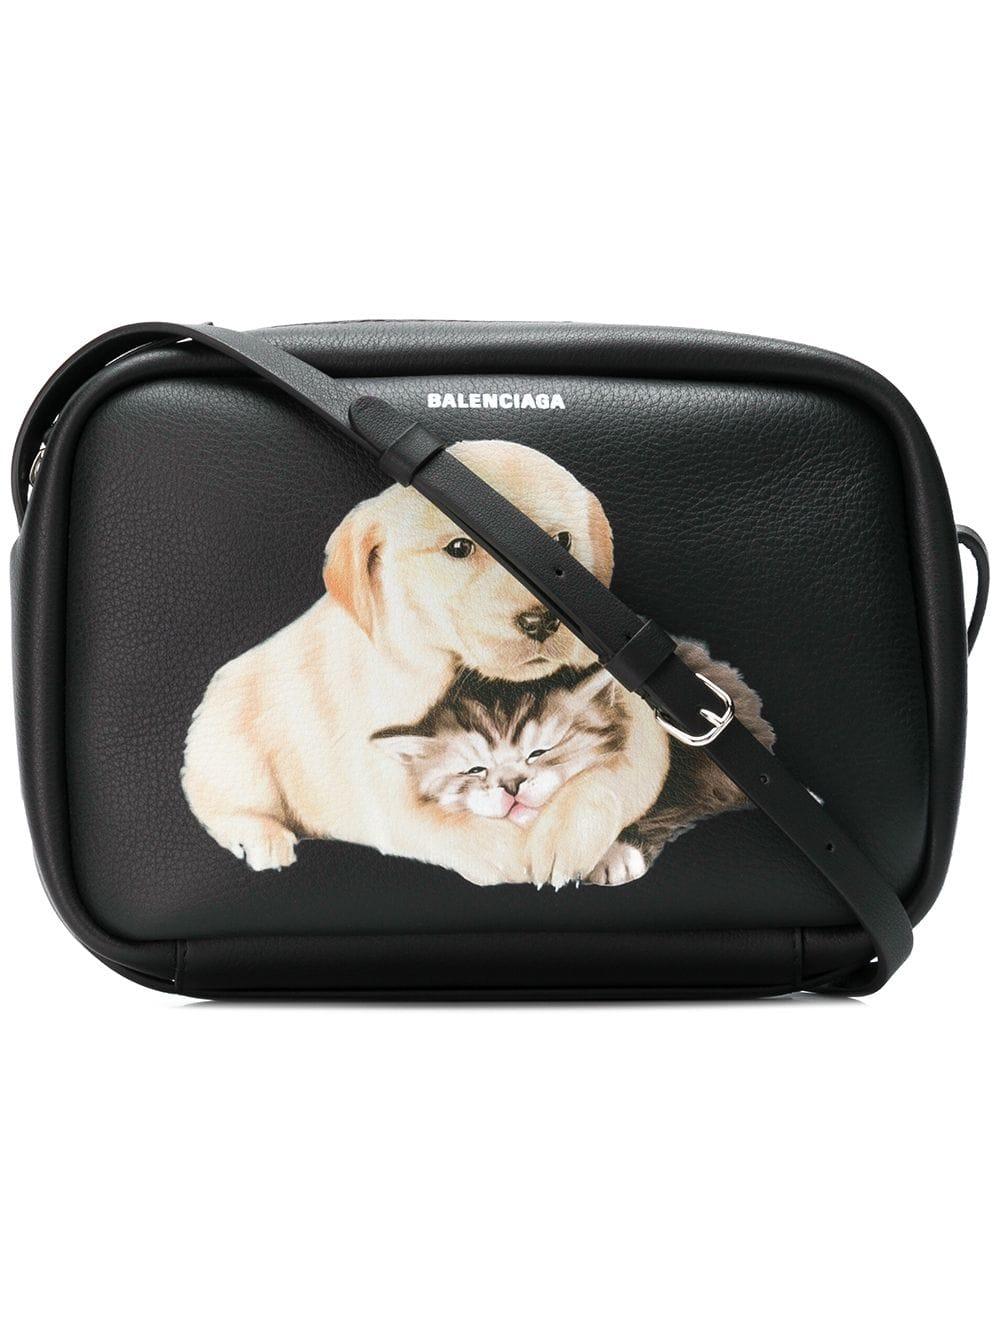 cbb9307fcb6 Balenciaga Puppy And Kitten Everyday S Bag in 2019